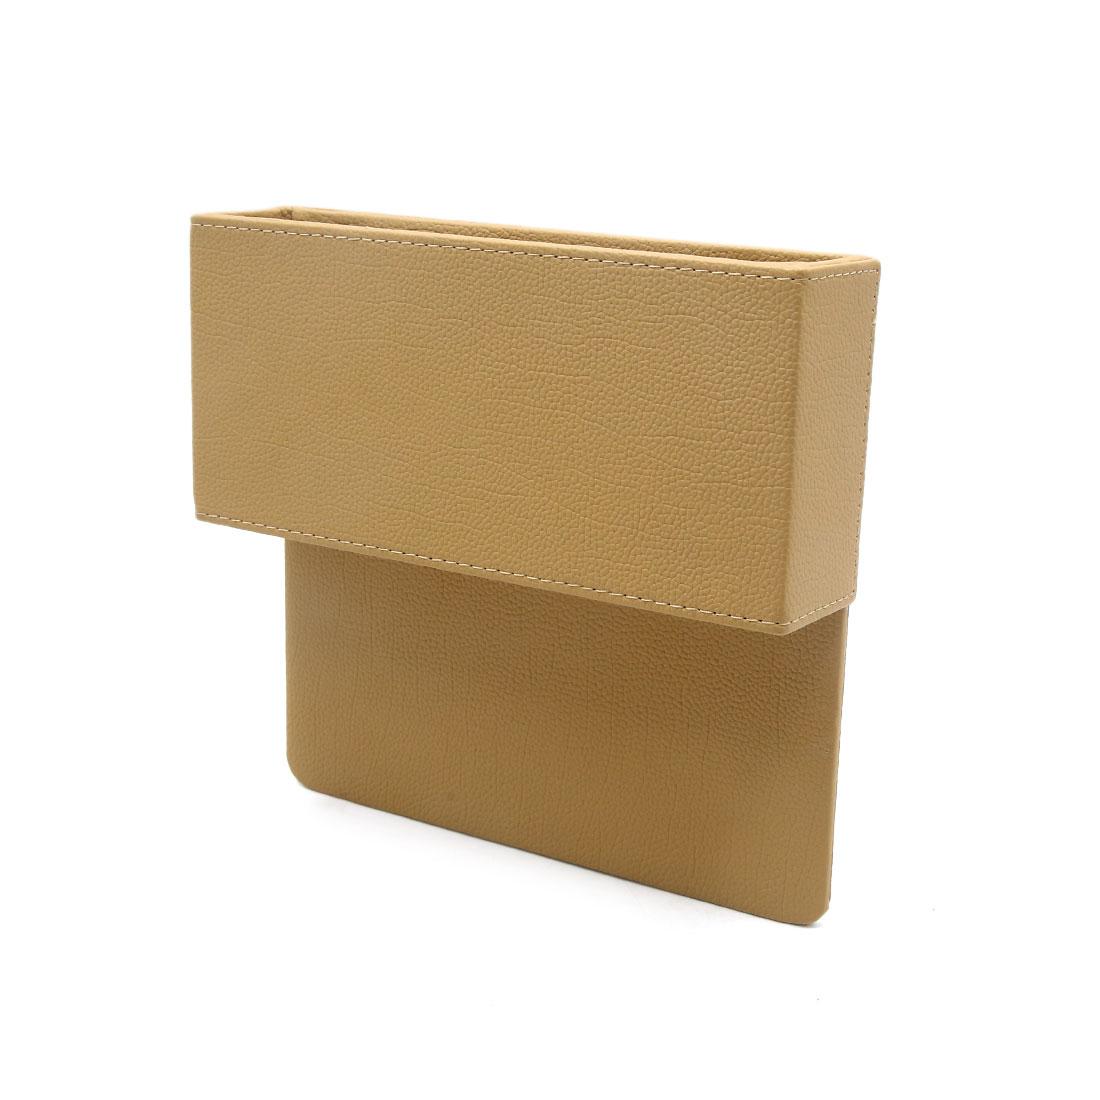 Beige Faux Leather Car Seat Gap Slit Pocket Storage Box Organizer Catcher